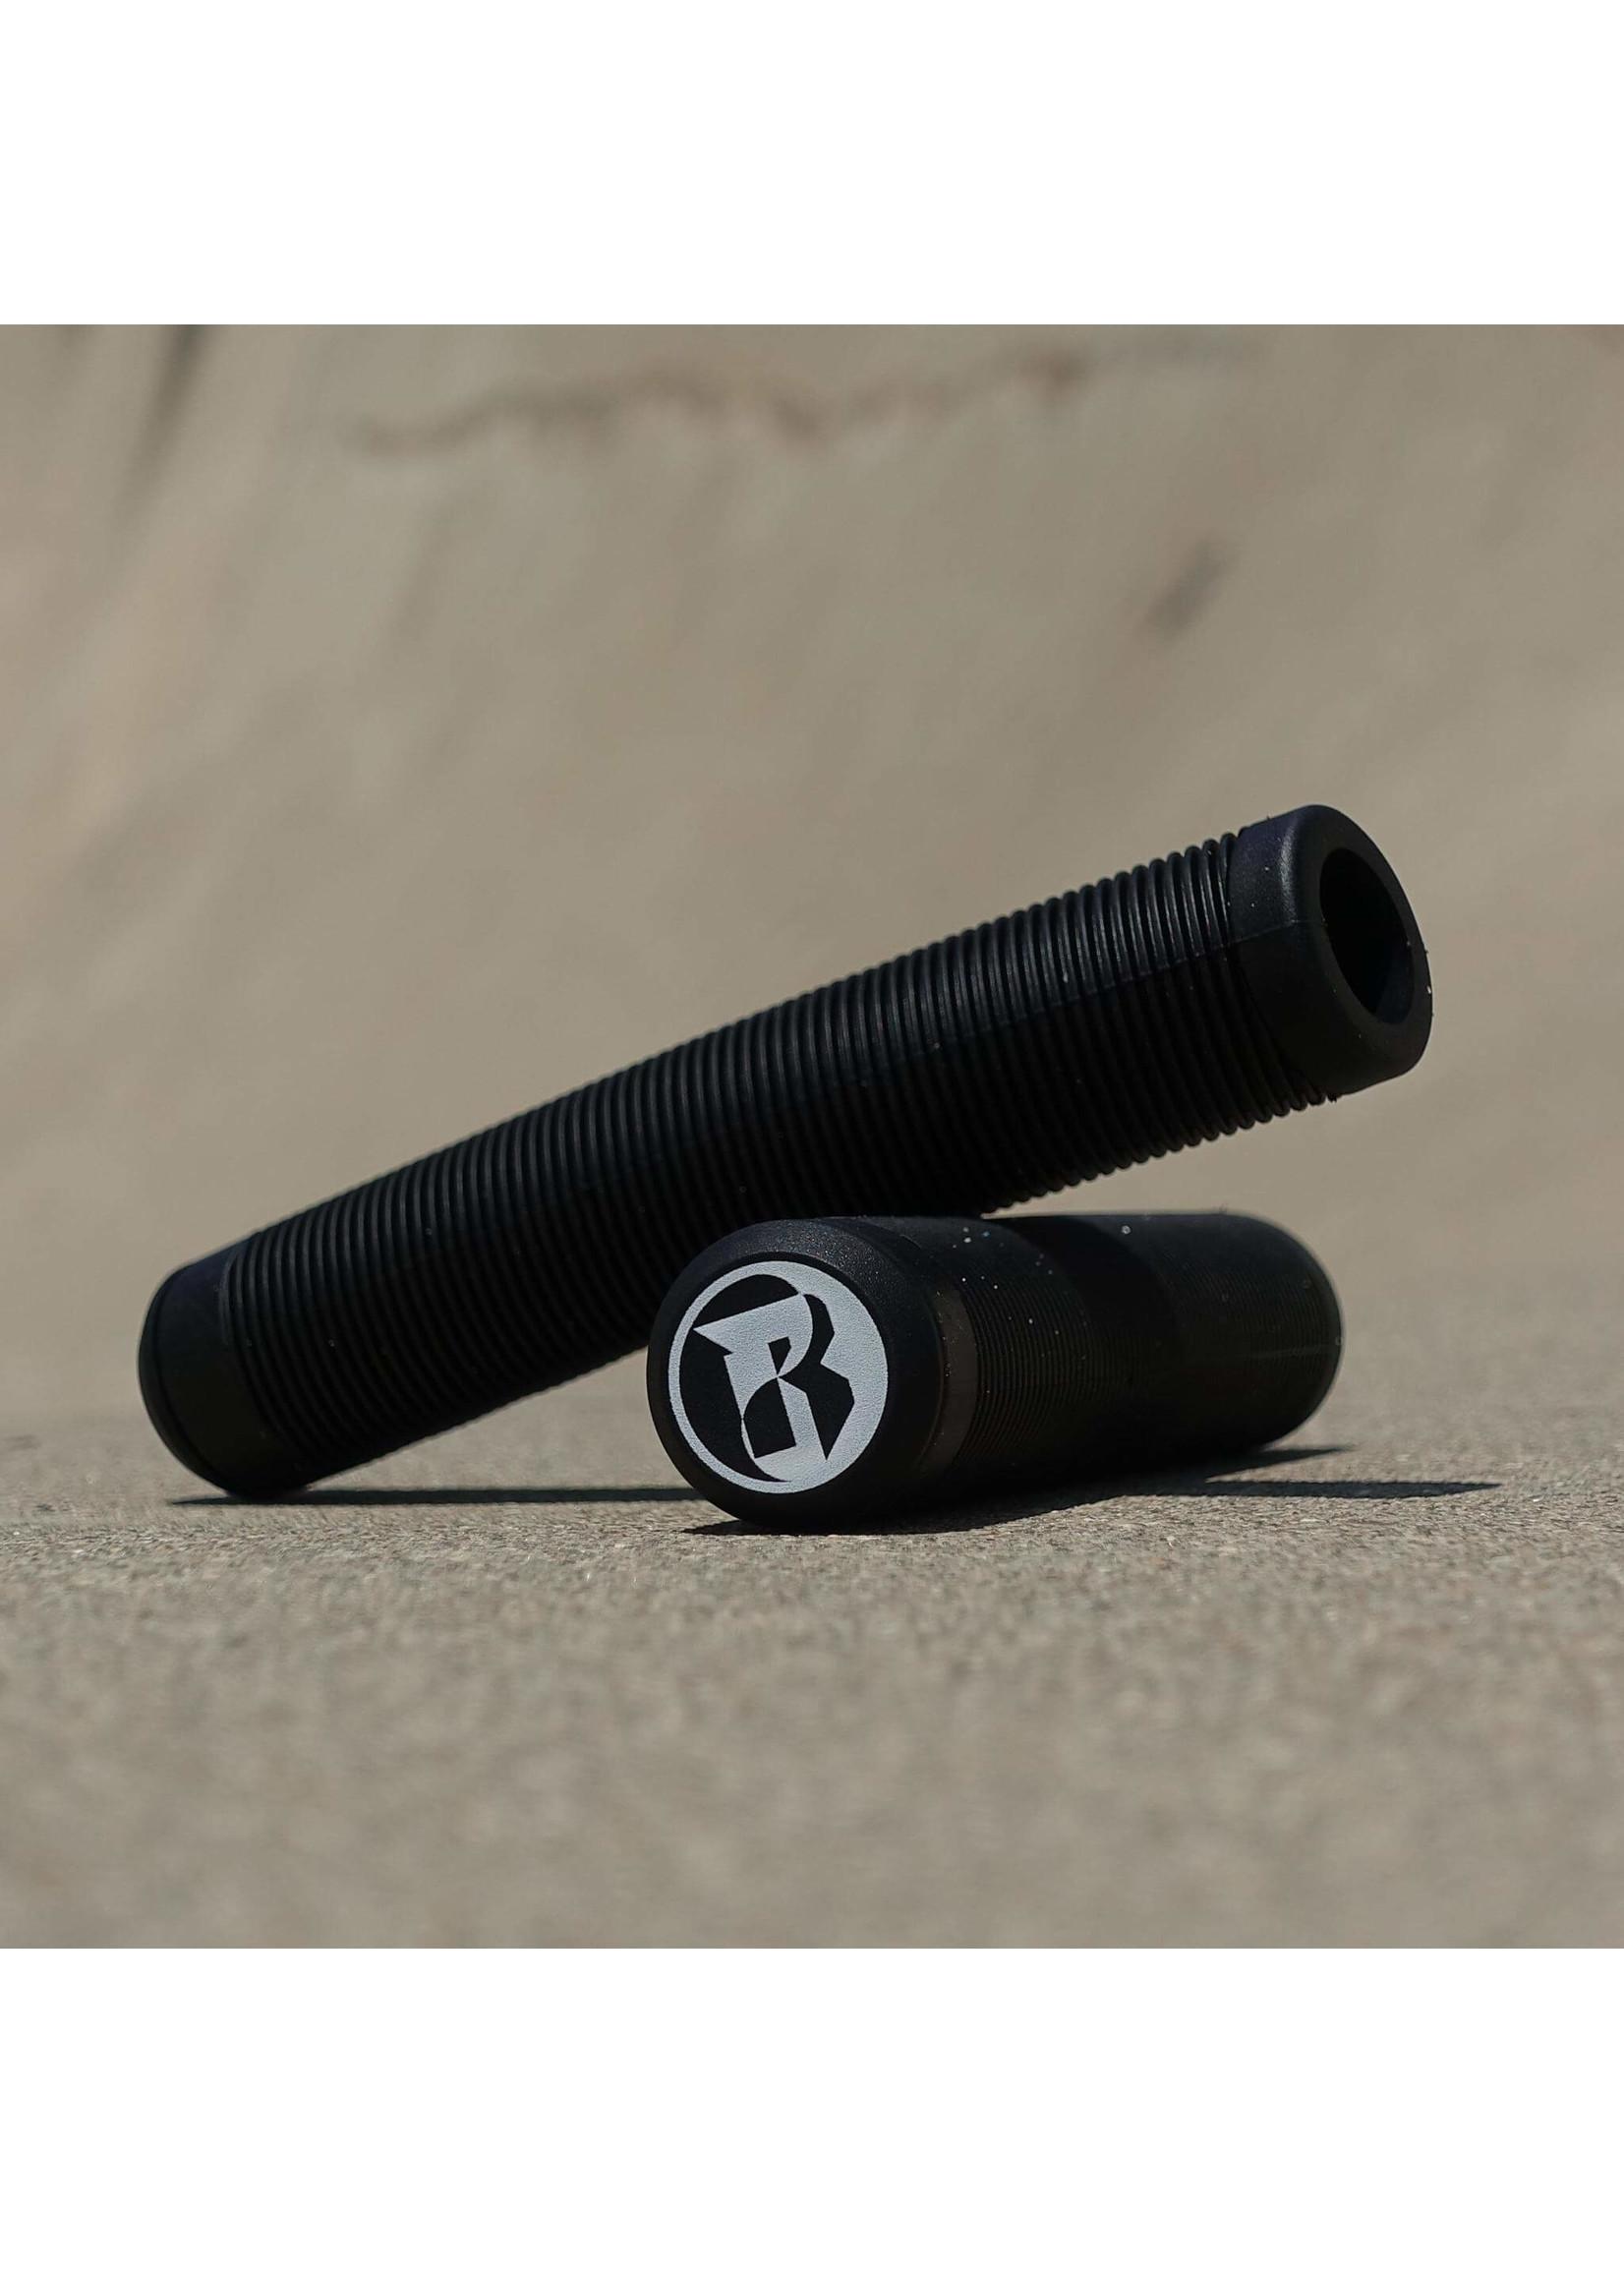 Rapture Rapture - Balanced Grips